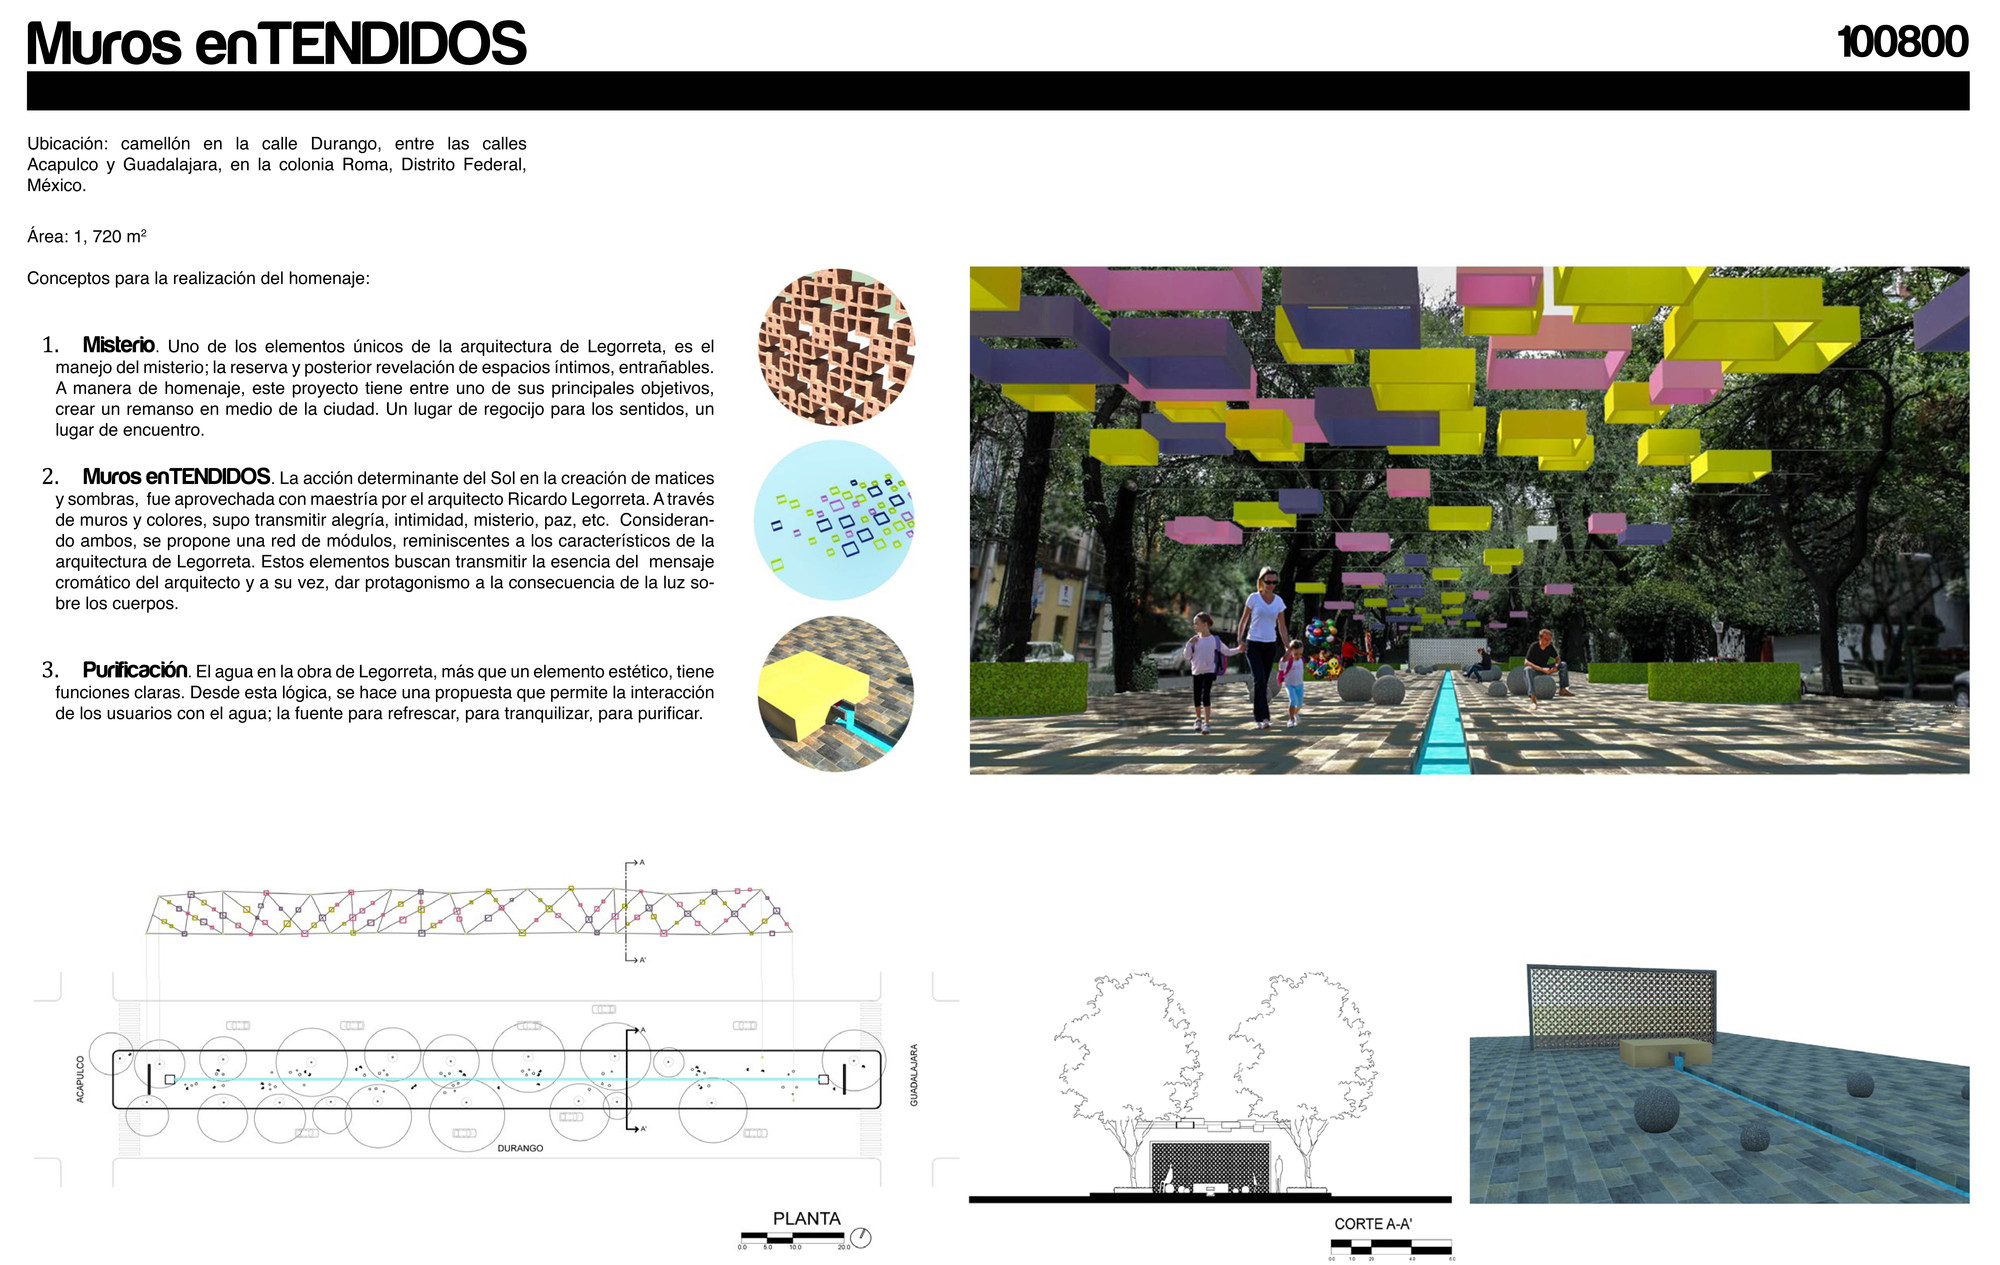 Ganadores del Concurso Internacional Homenaje Urbano Legorreta + FUGA , 1er Lugar